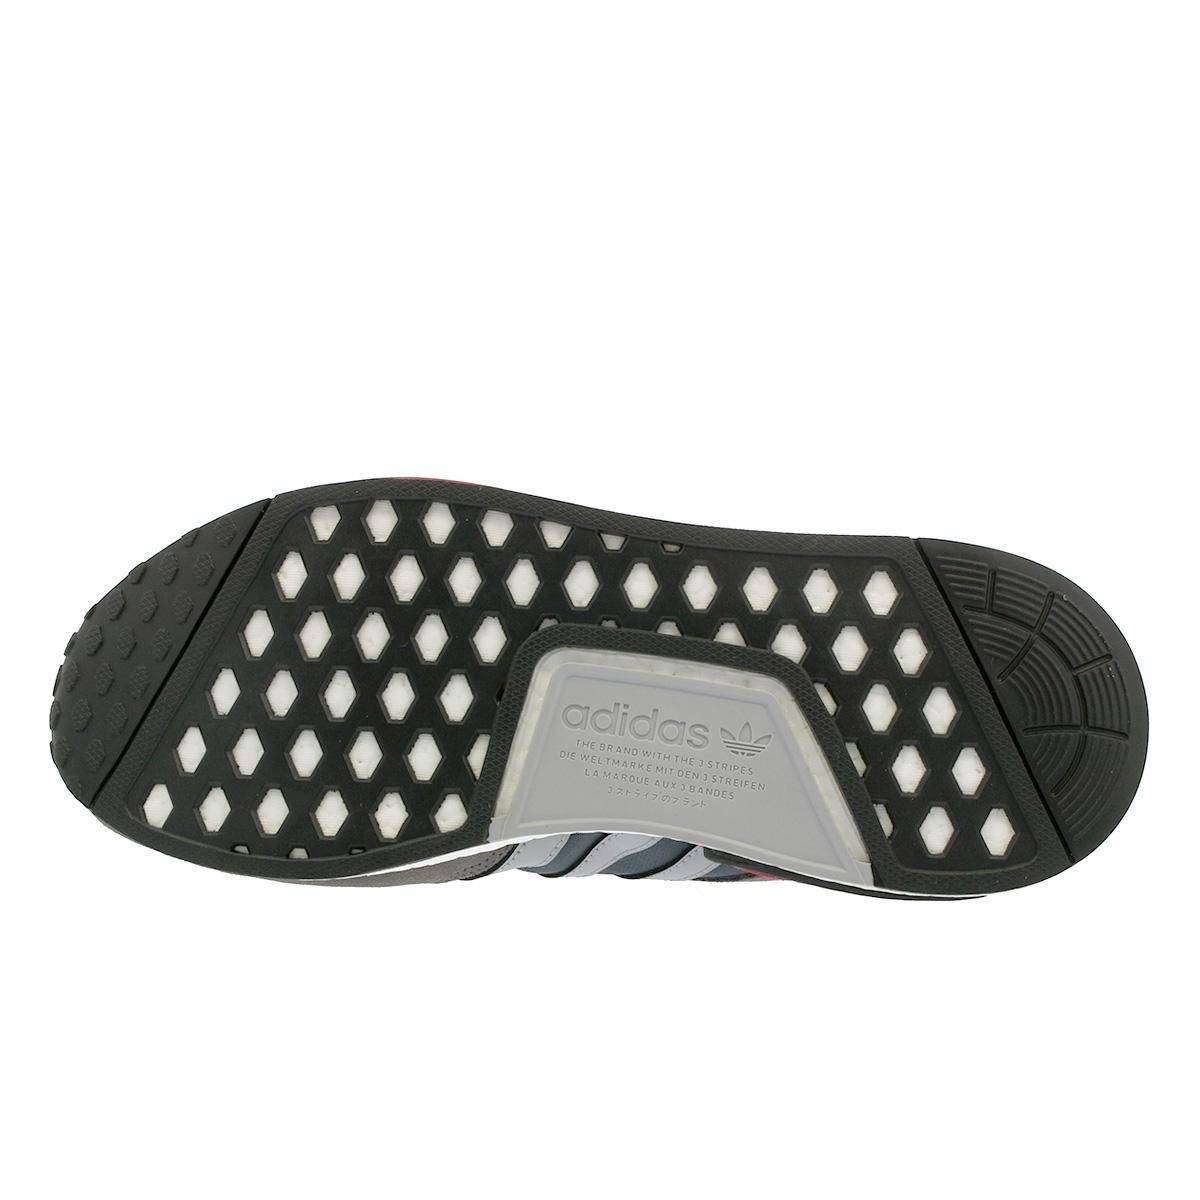 227407b96 adidas BOSTONSUPER x R1 Adidas Boston supermarket x R1 BOLD ONIX CLEAR ONIX RUNNING  WHITE g26776